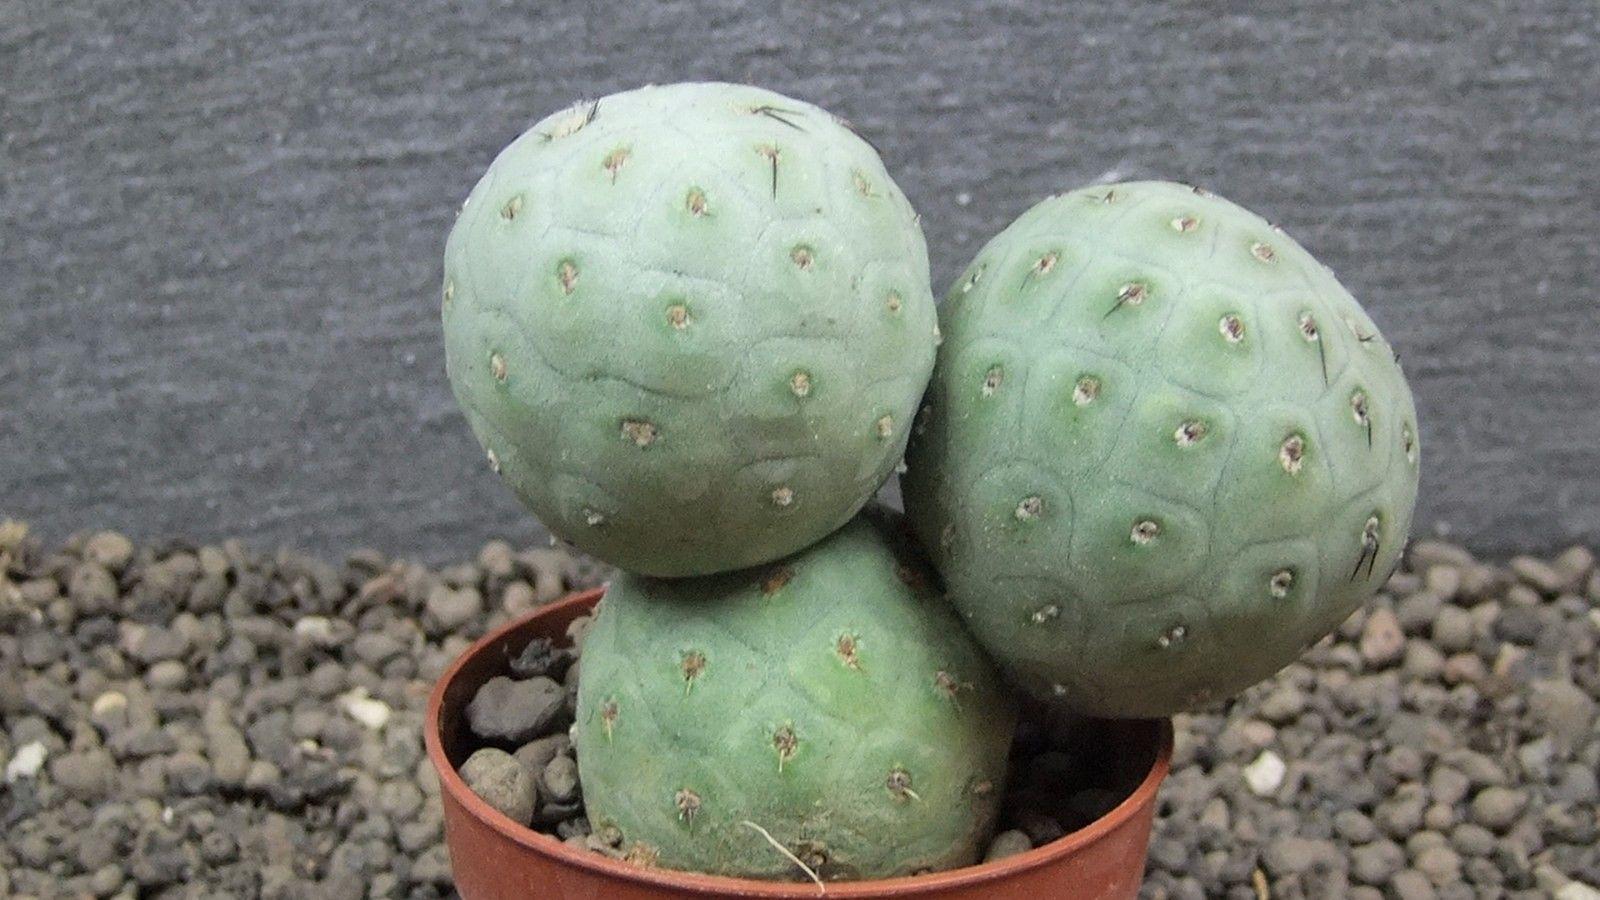 cacti 8K10 Tephrocactus geometricus select XL size, flowerpot is 6,5 cm | eBay